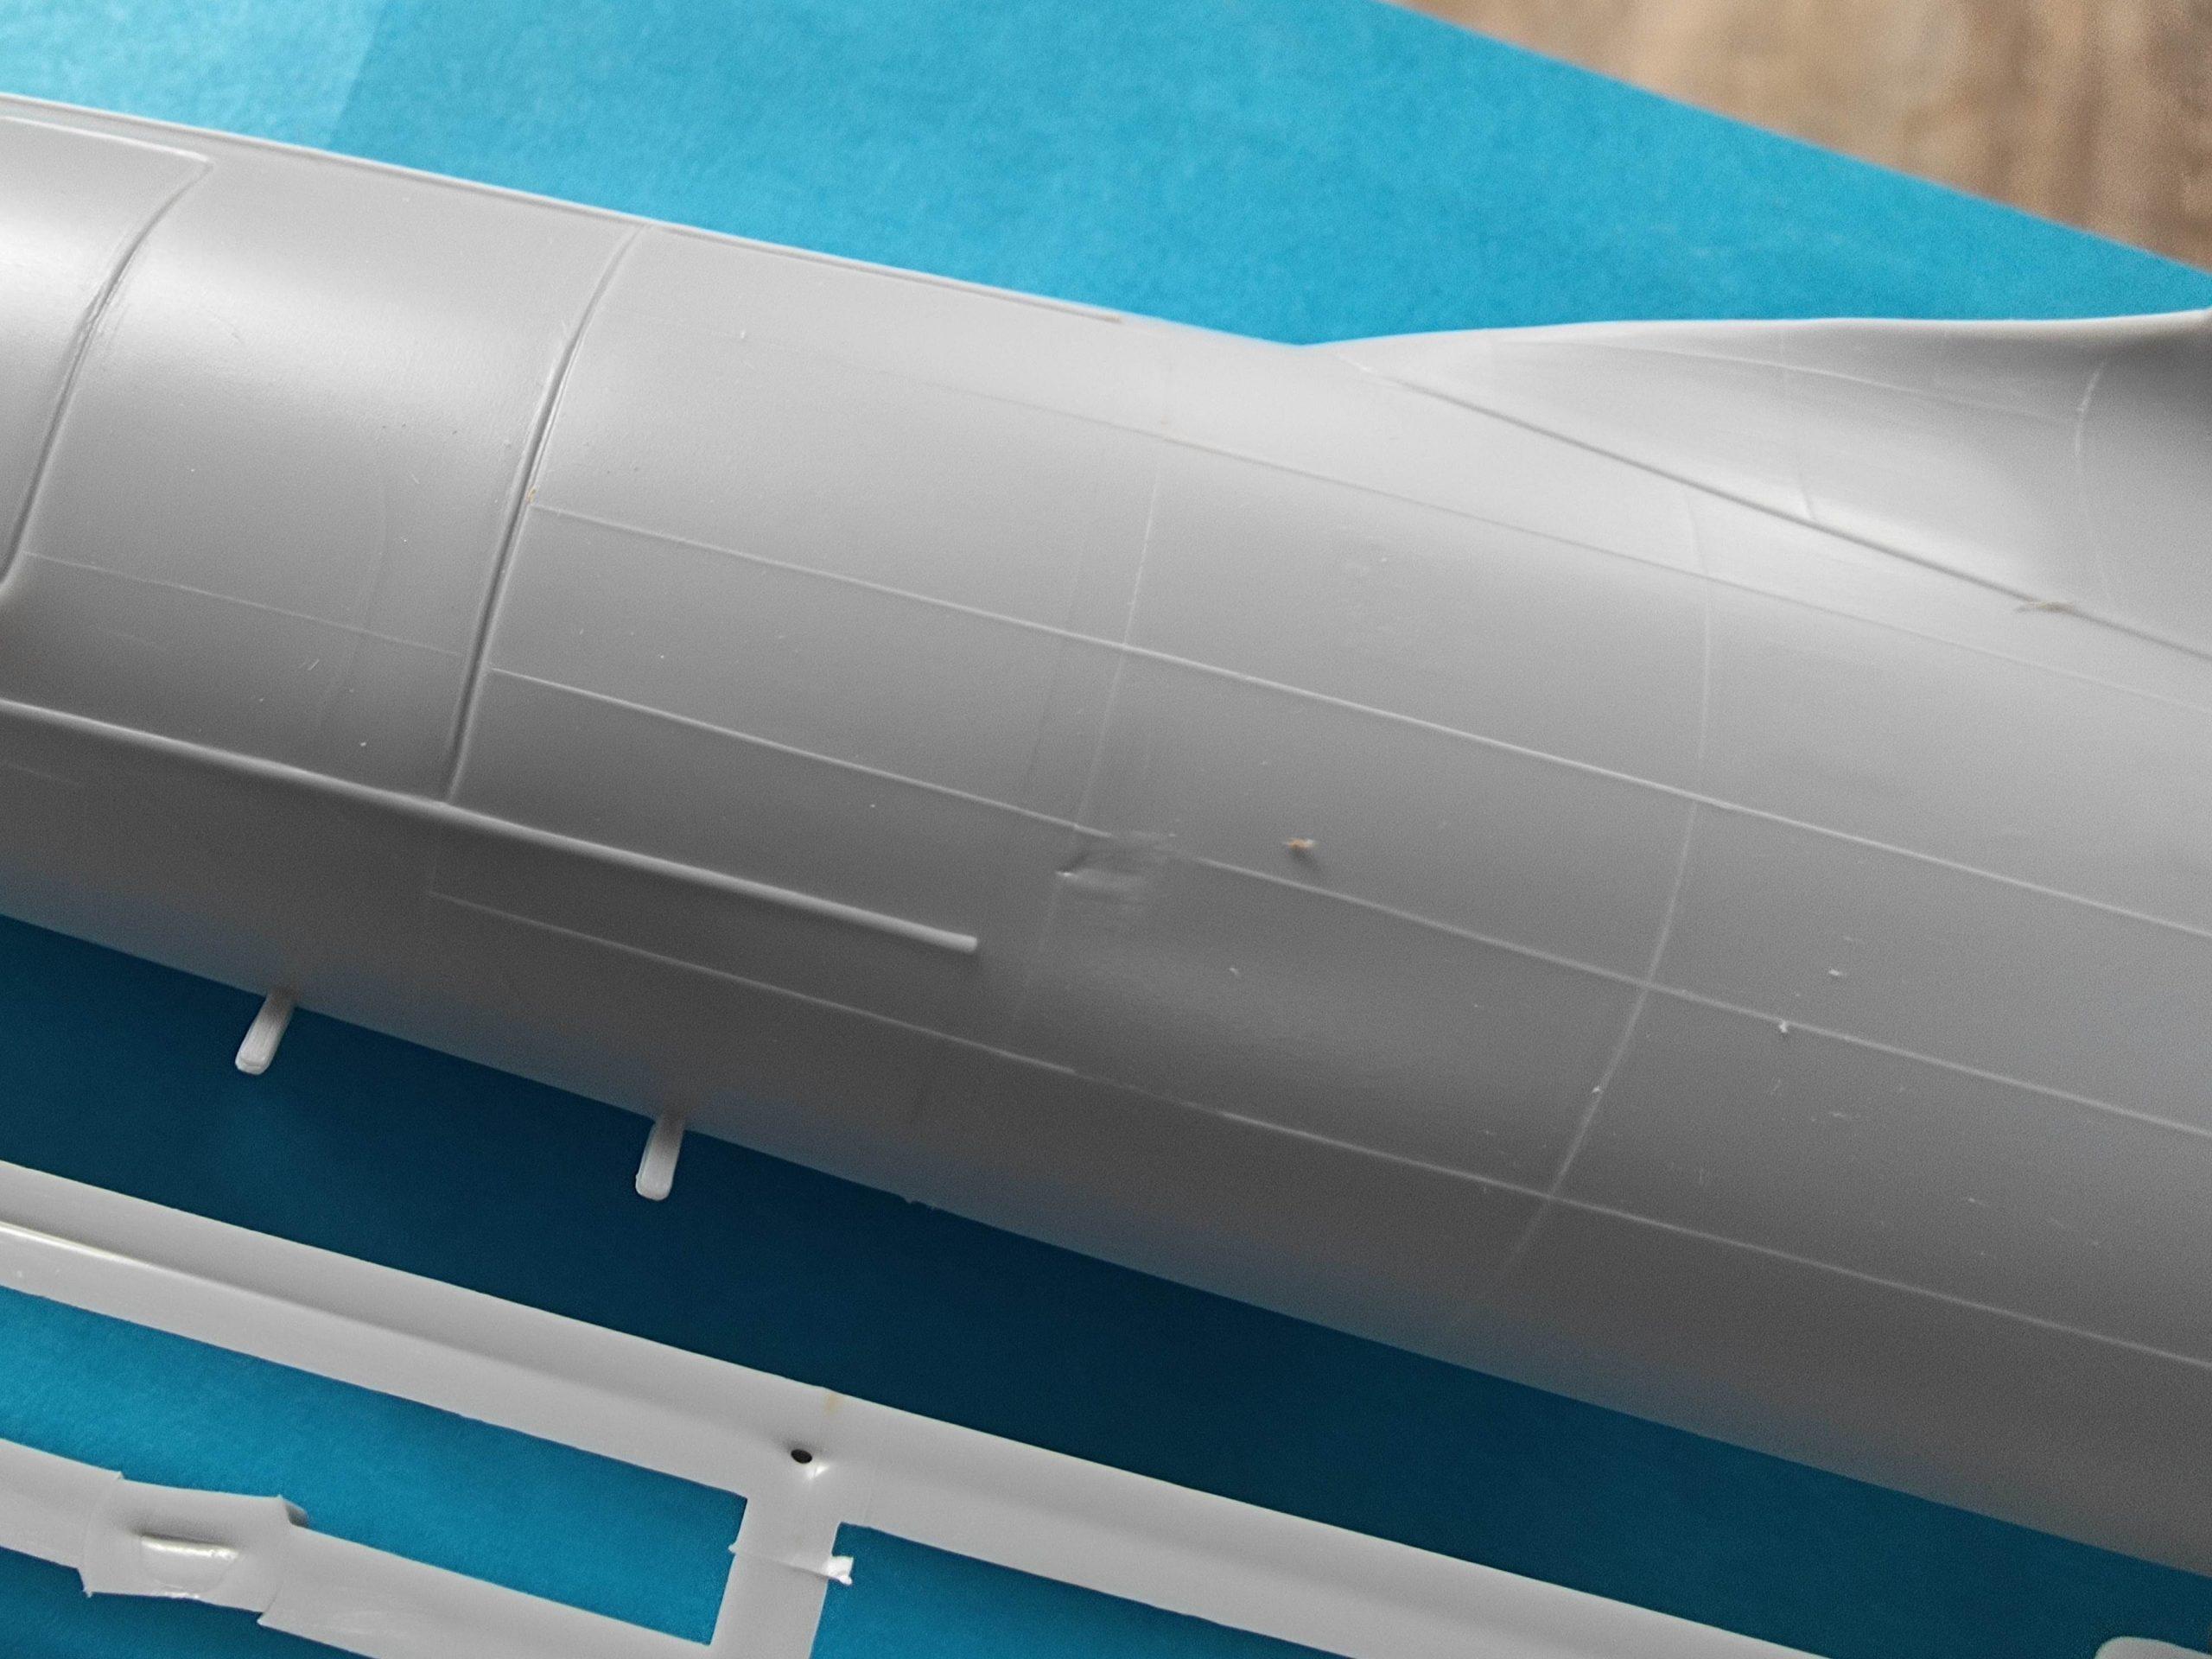 heller_lockheed_warn08-scaled Lockheed EC-121 Warning Star von Heller in 1:72